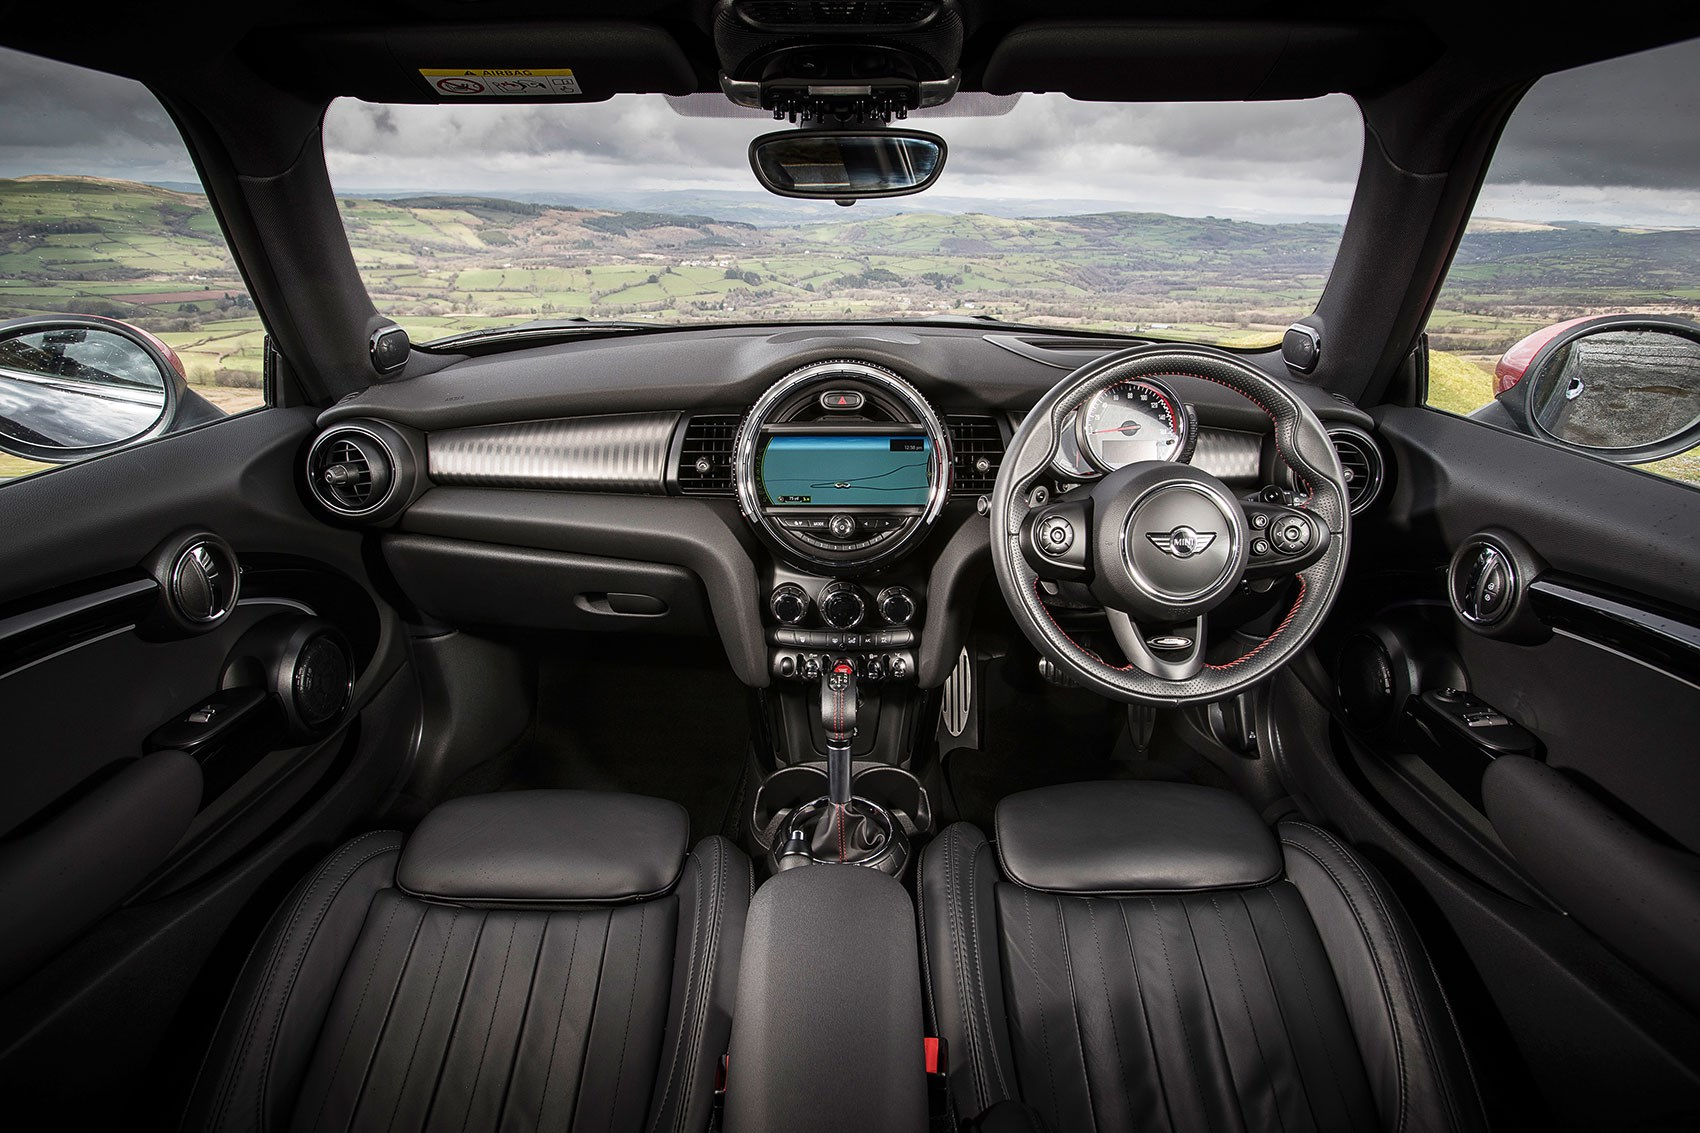 Vw Golf Gti Vs Peugeot 308 Gti Vs Mini Jcw Triple Test Review 2017 Car Magazine